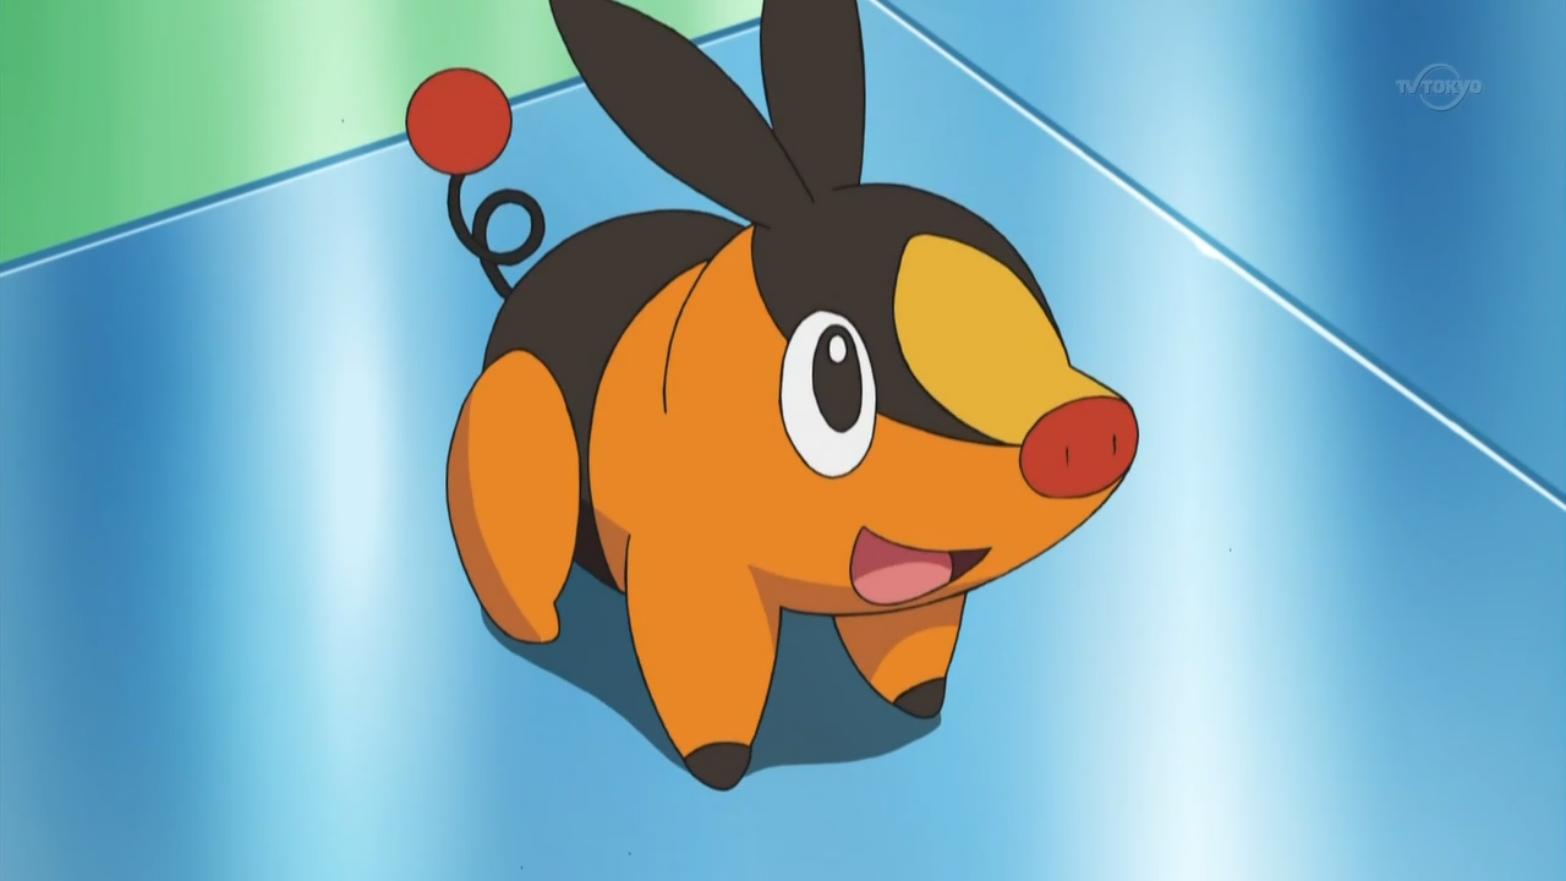 Nanette chose Tepig as her starter Pokémon.